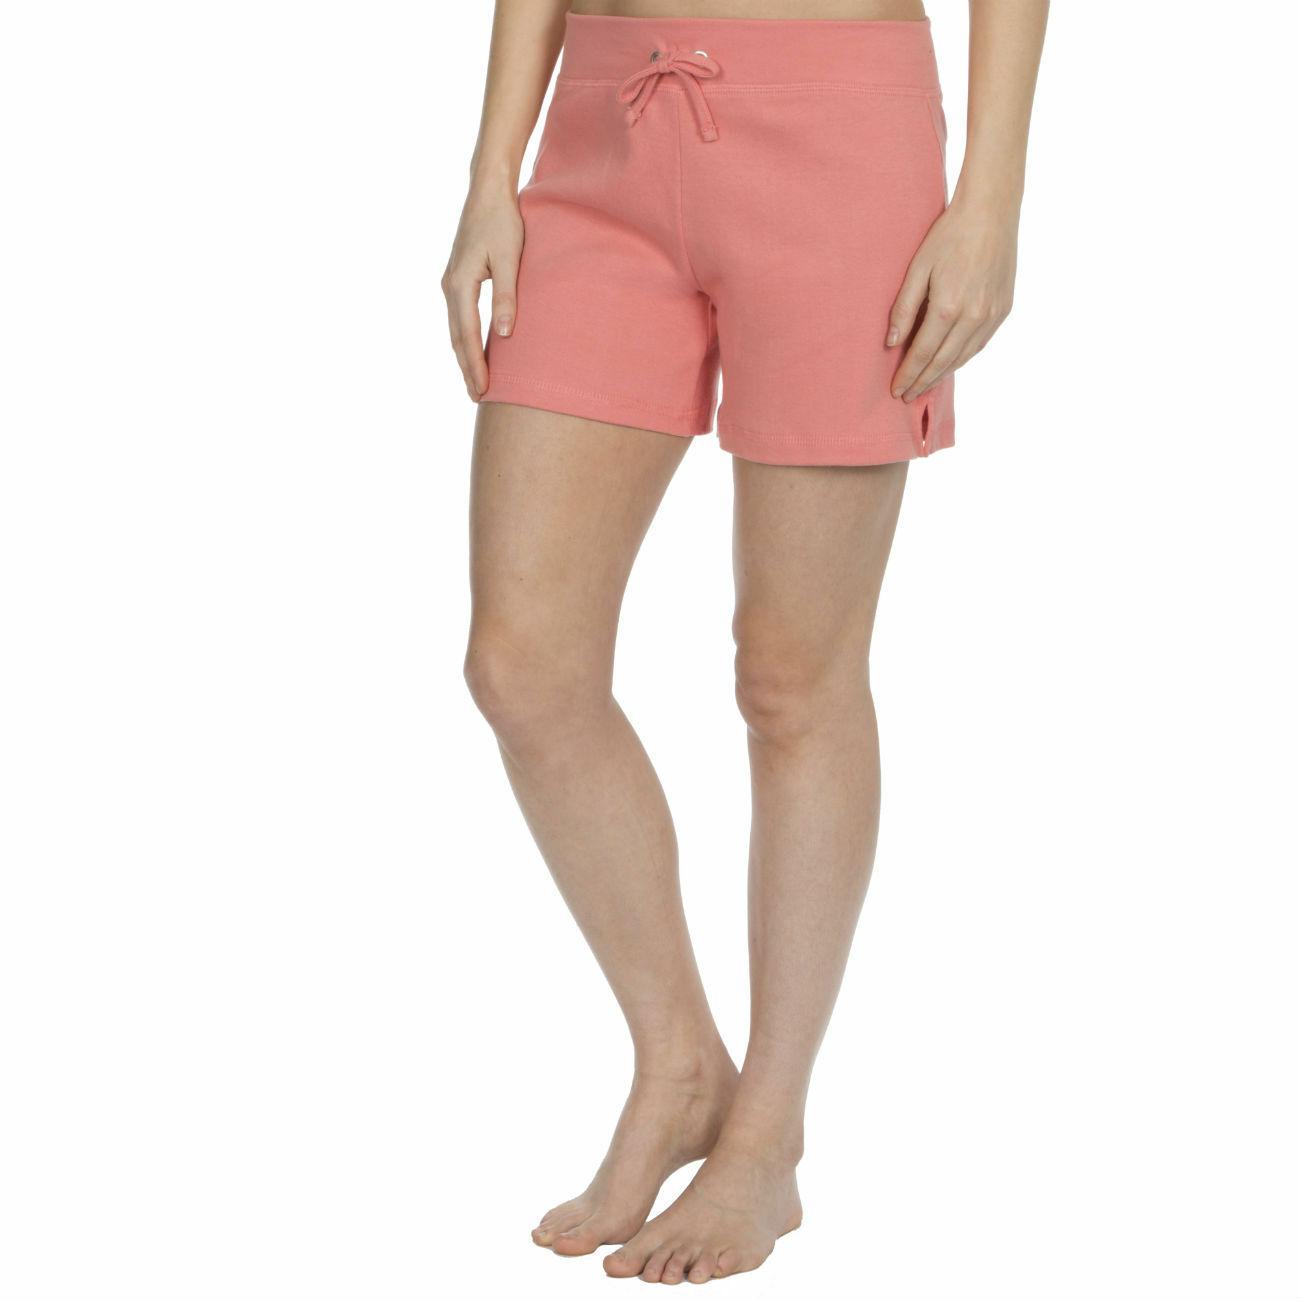 Womens-Cotton-Jersey-Shorts-Elastic-Waist-Summer-Beach-Casual-Yoga-Hot-Pants-New thumbnail 36